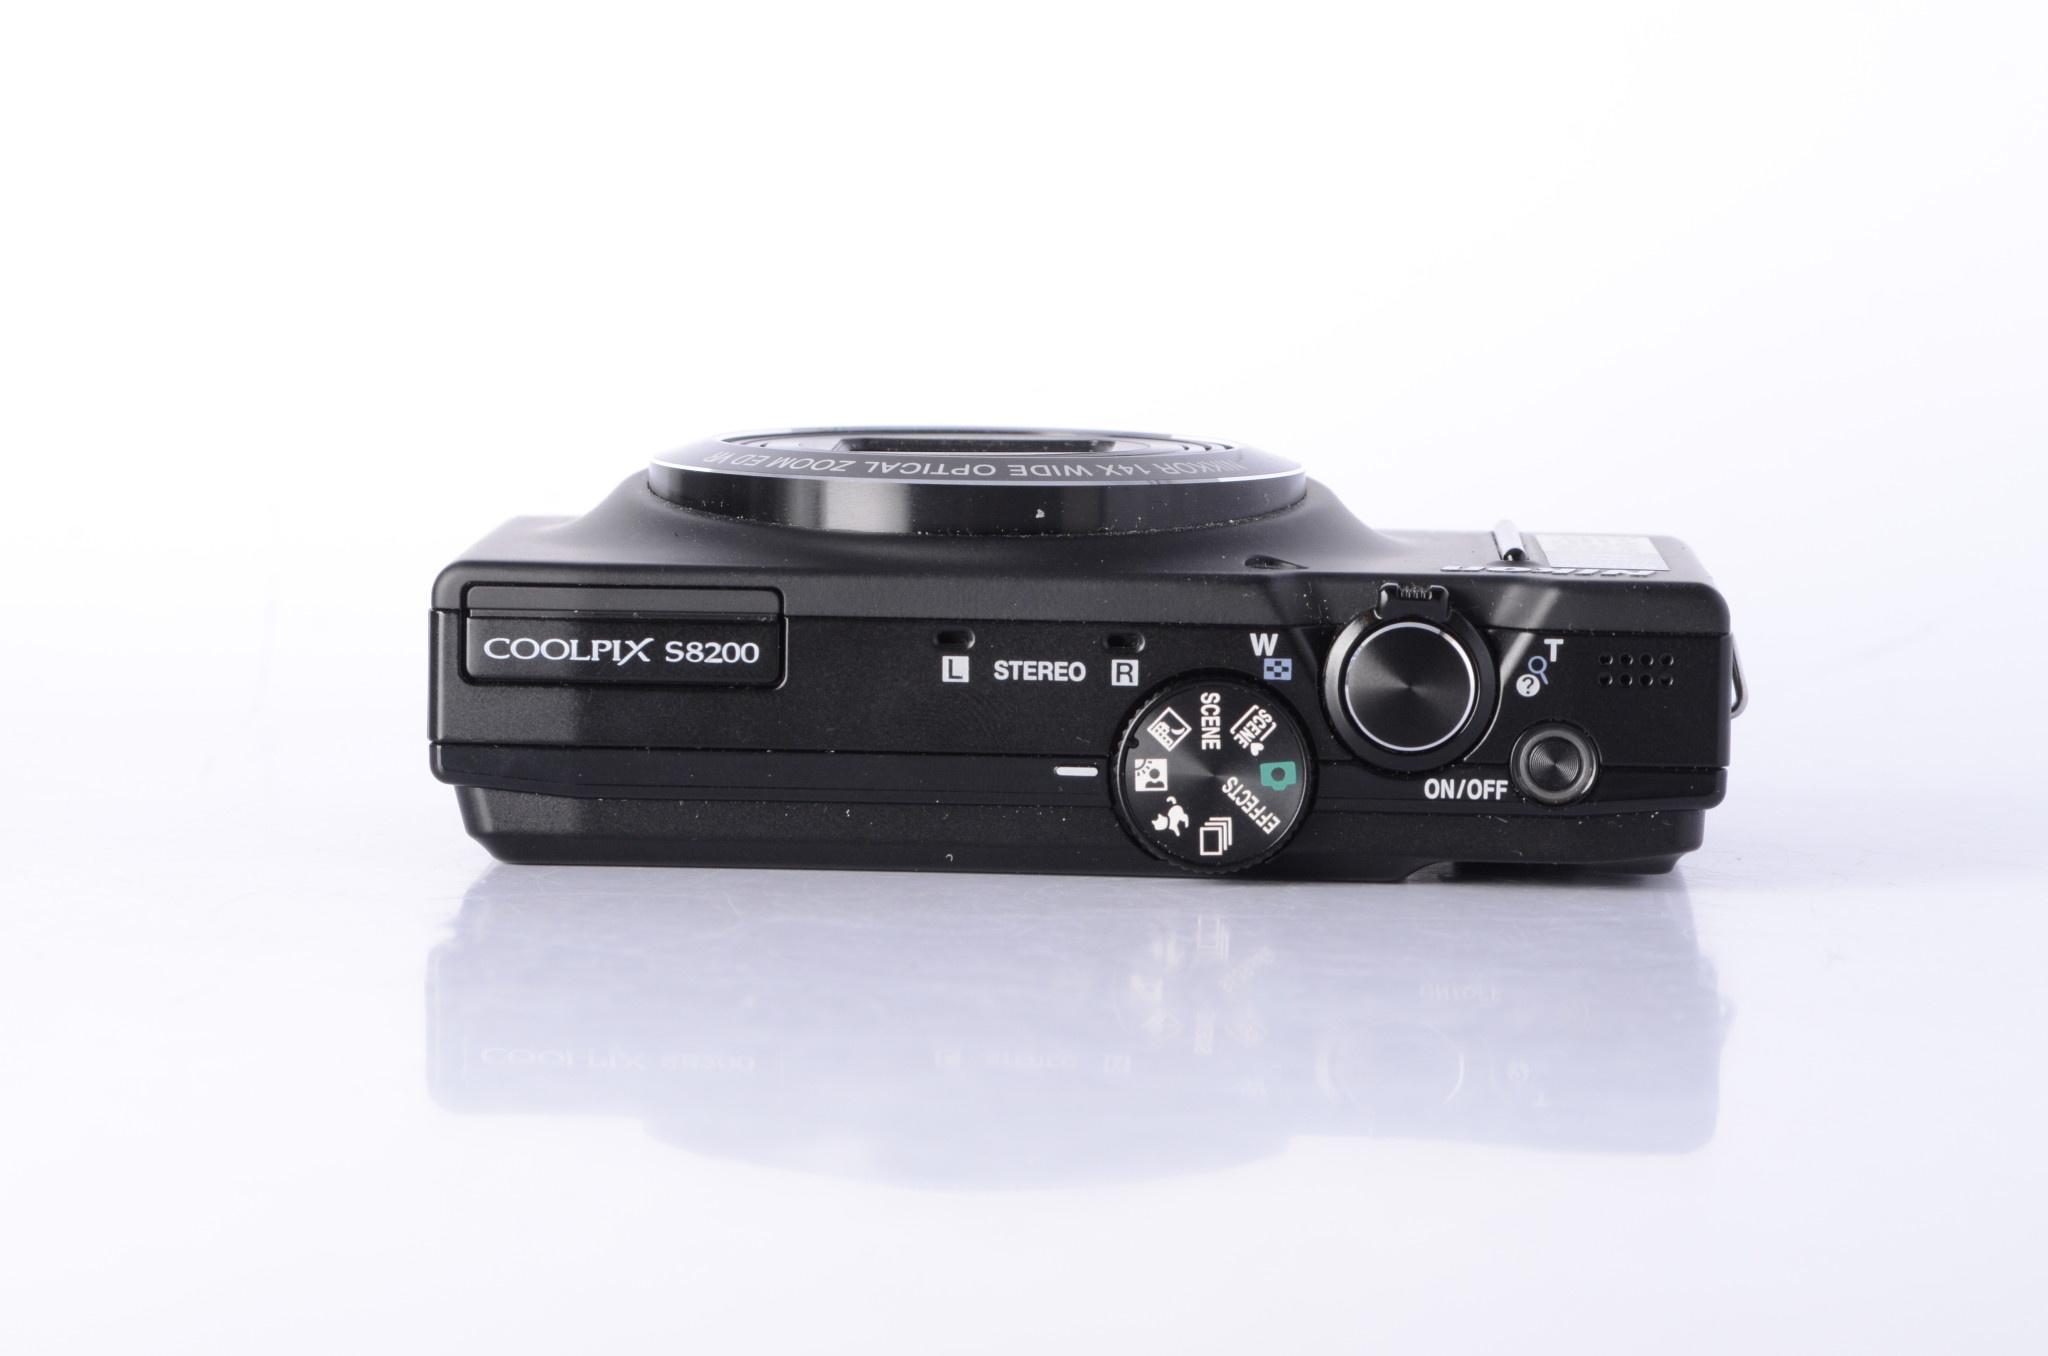 Nikon Nikon Coolpix S8200 Point and Shoot Digital Camera SN: 31052911 *